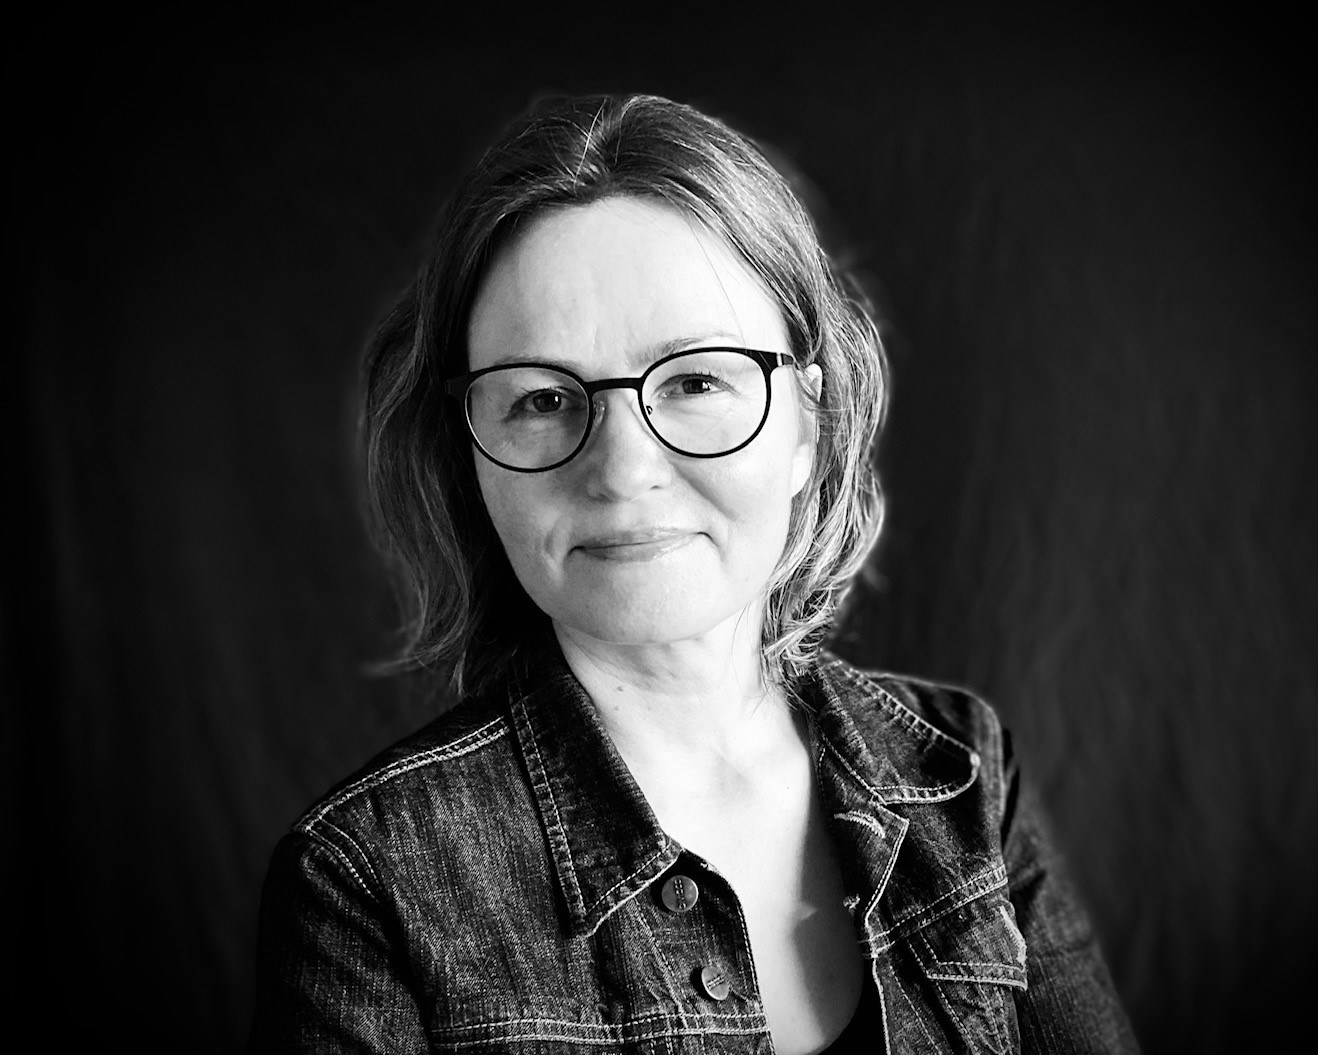 Johanna Myllymäki